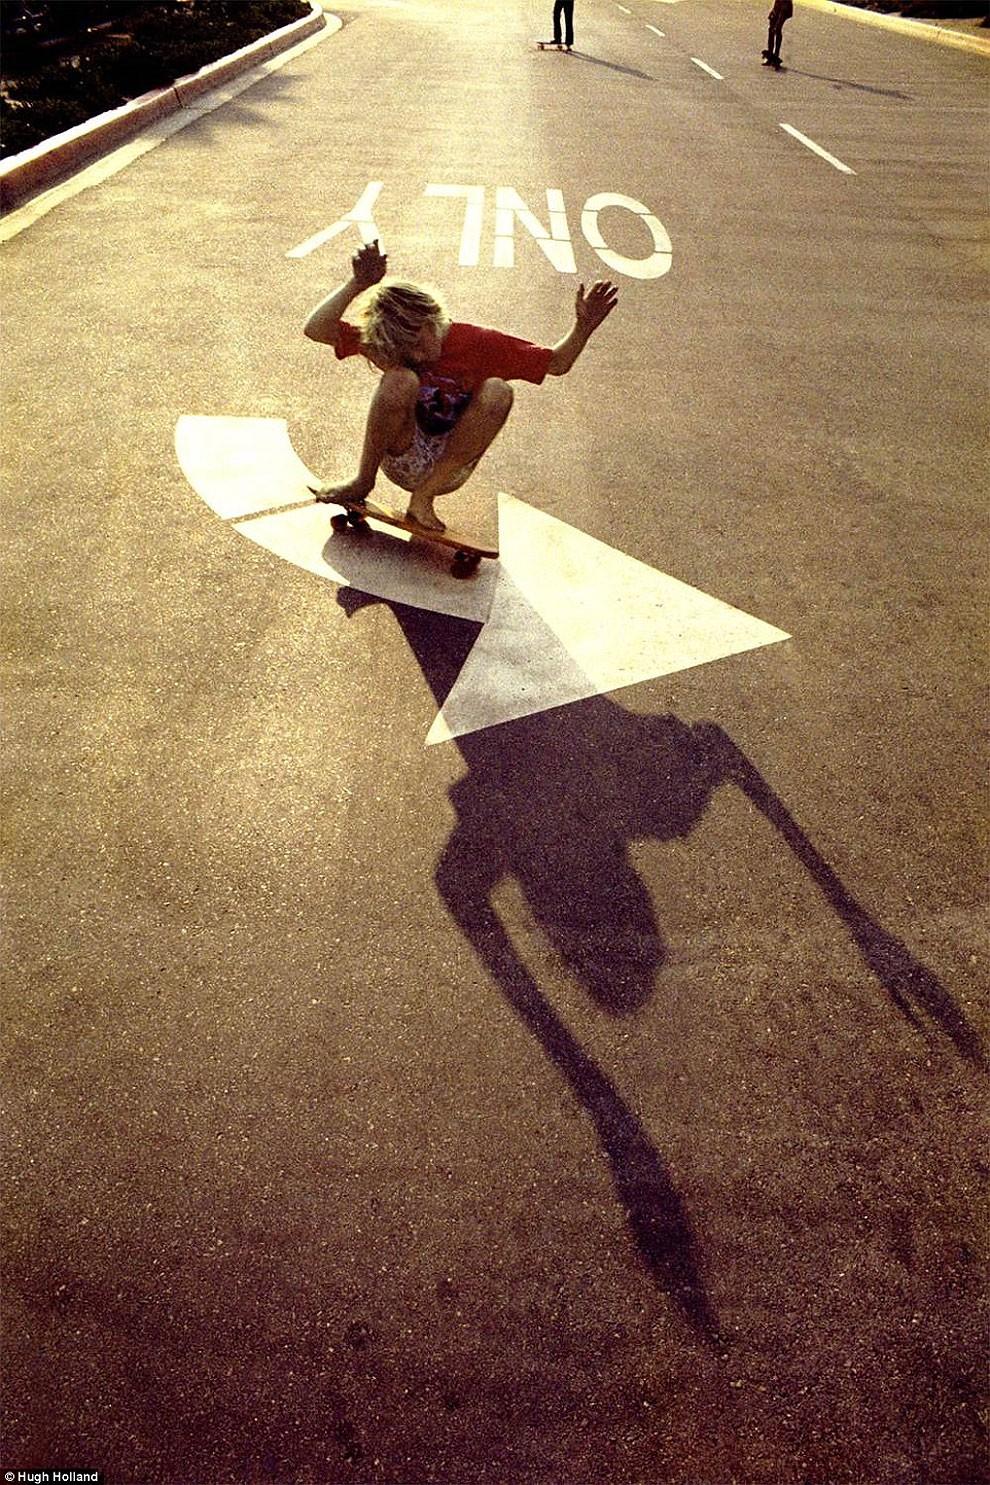 fotografia-skateboard-cultura-usa-anni-70-libro-hugh-holland-10